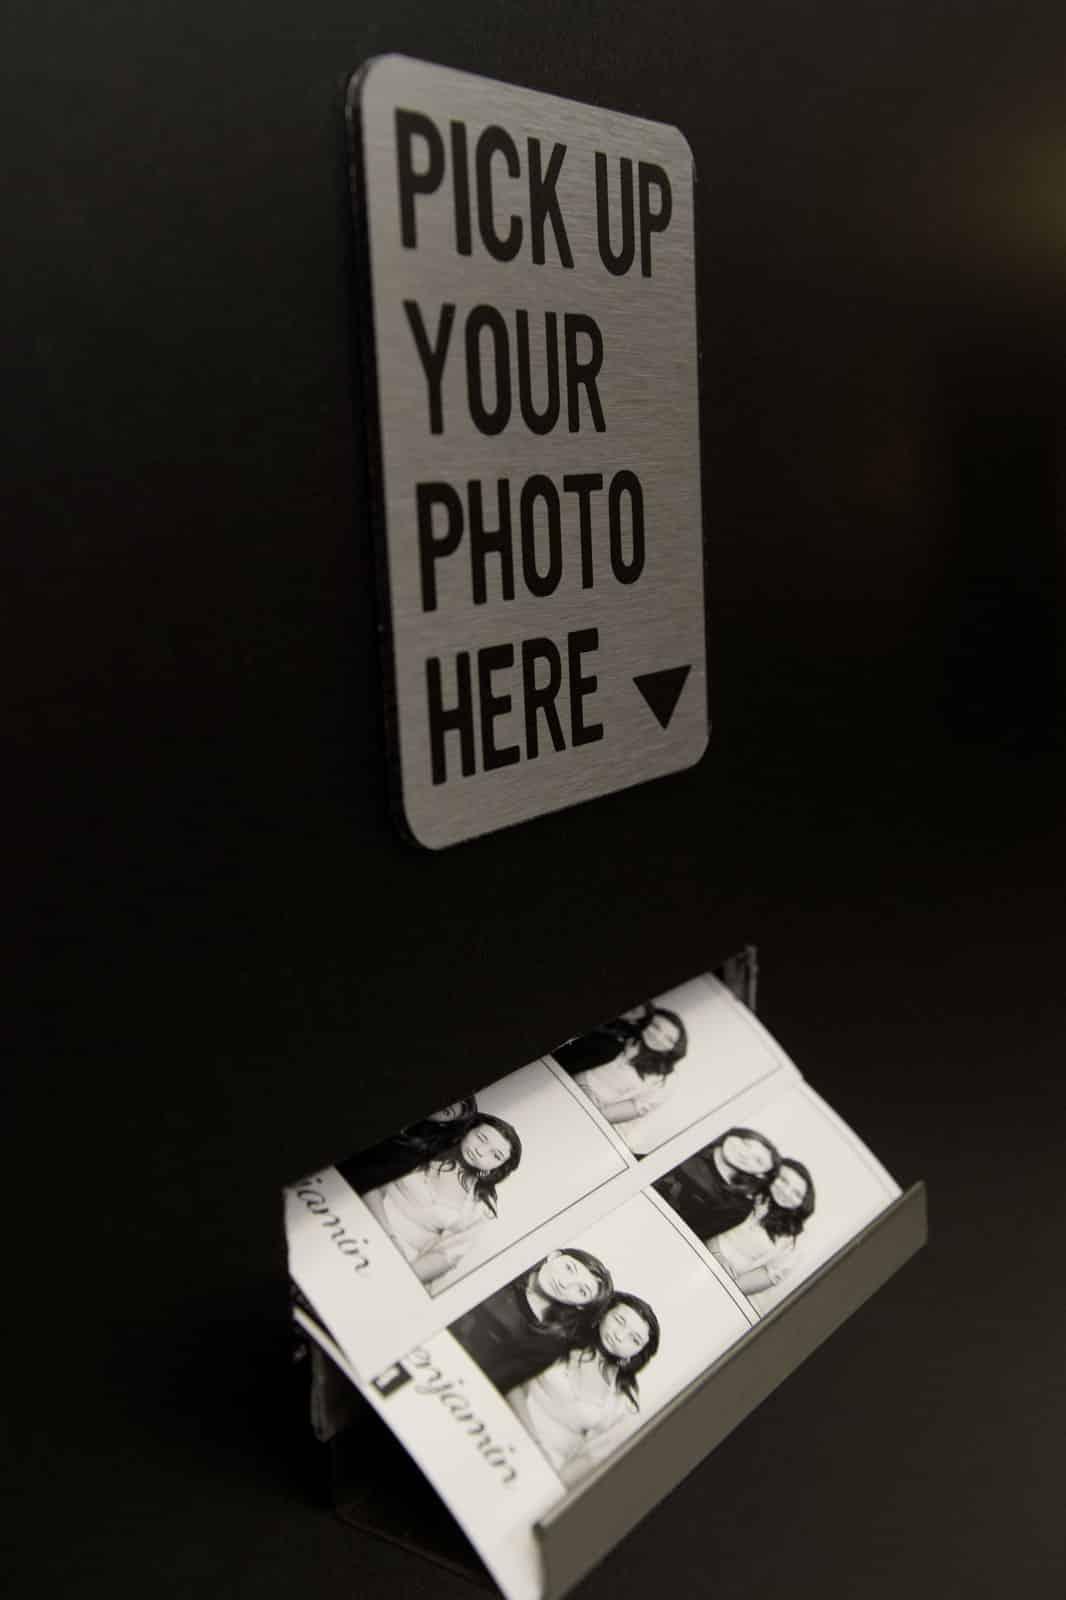 Studio photos entreprise  AE image blackbox 2